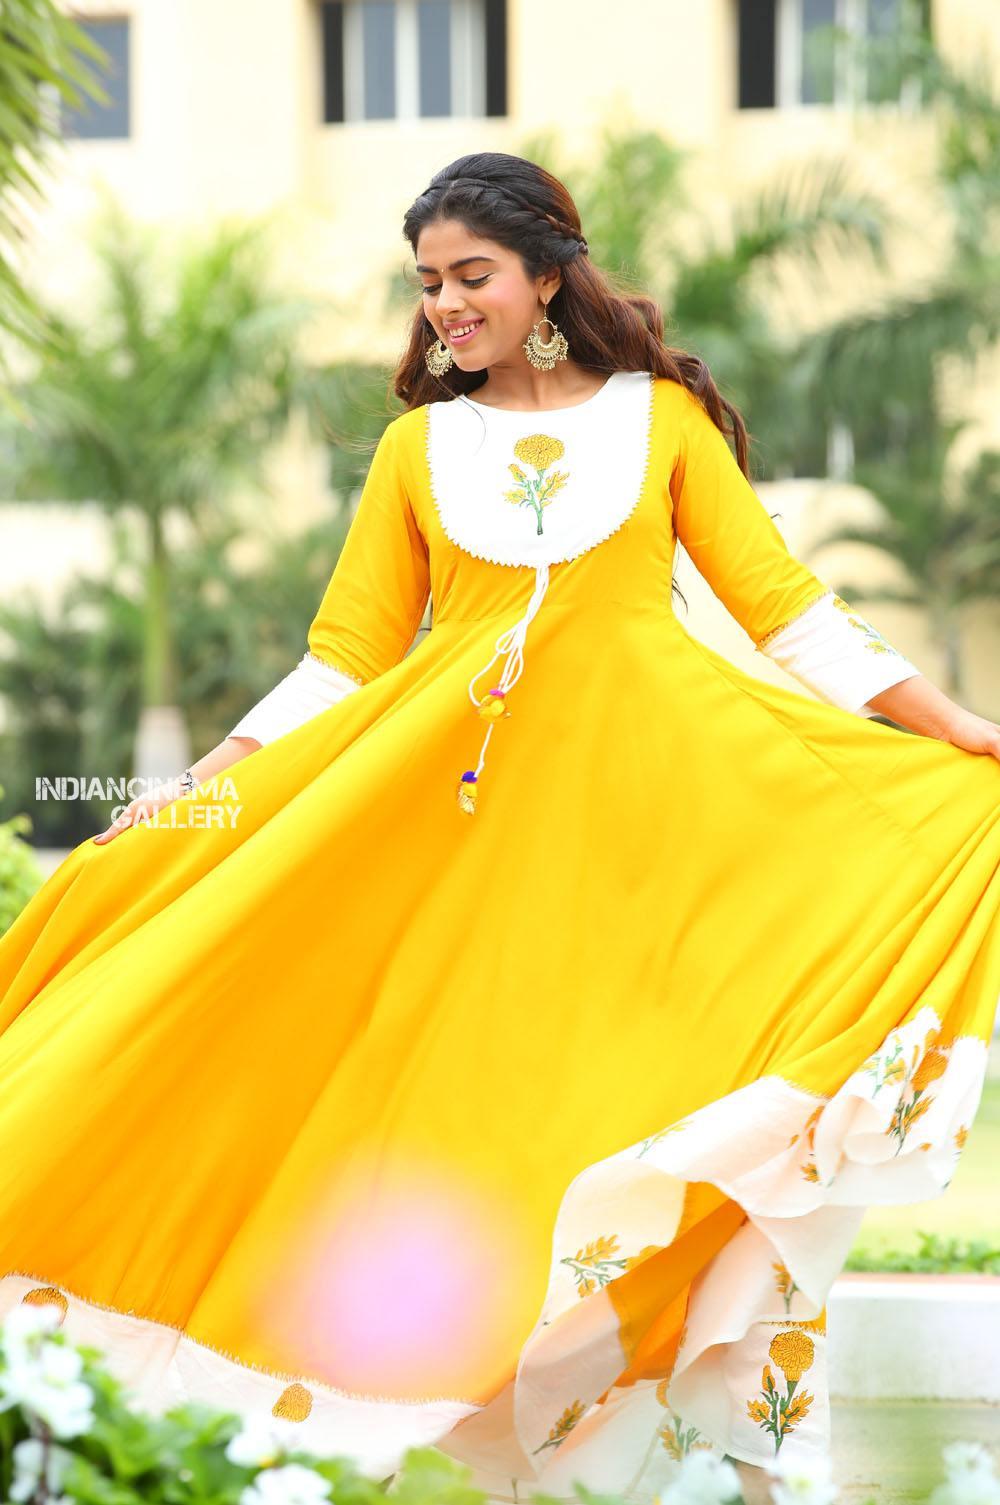 siddhi idnani in Prema Katha Chitram 2 Movie (10)